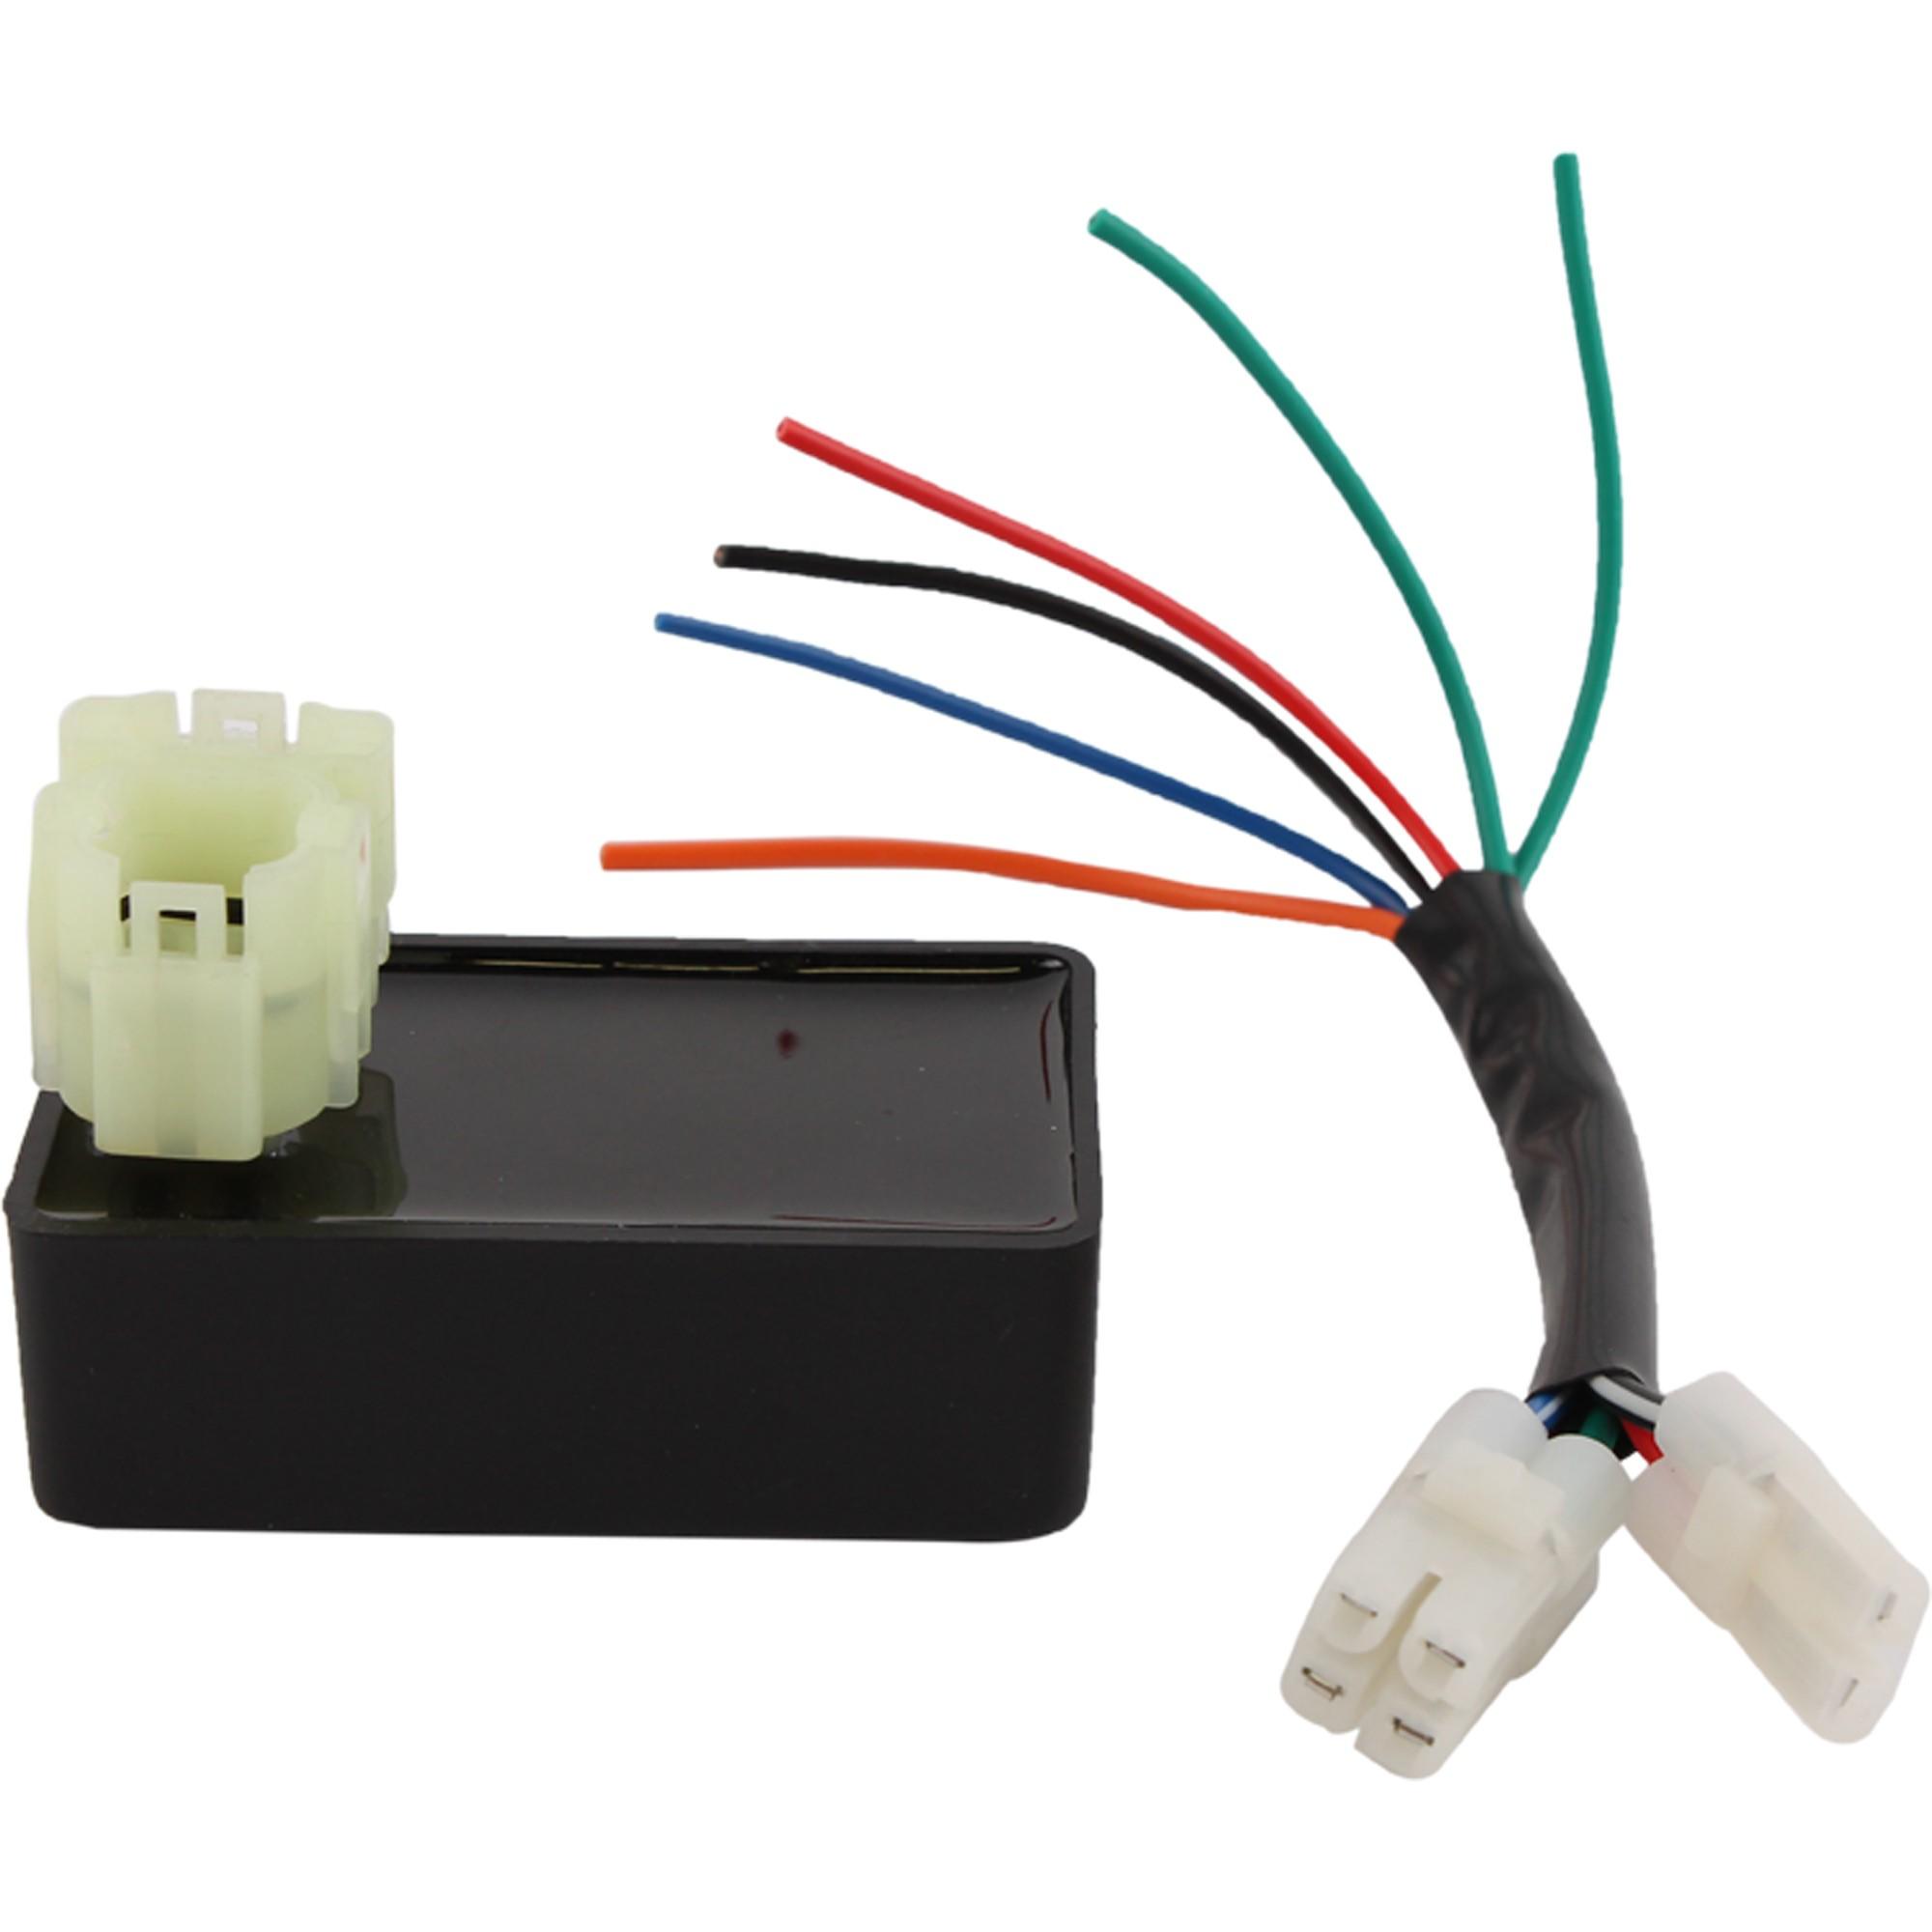 hight resolution of details about new cdi module box for honda xr600 xr 600 1988 2000 advance iha6019 esp1550